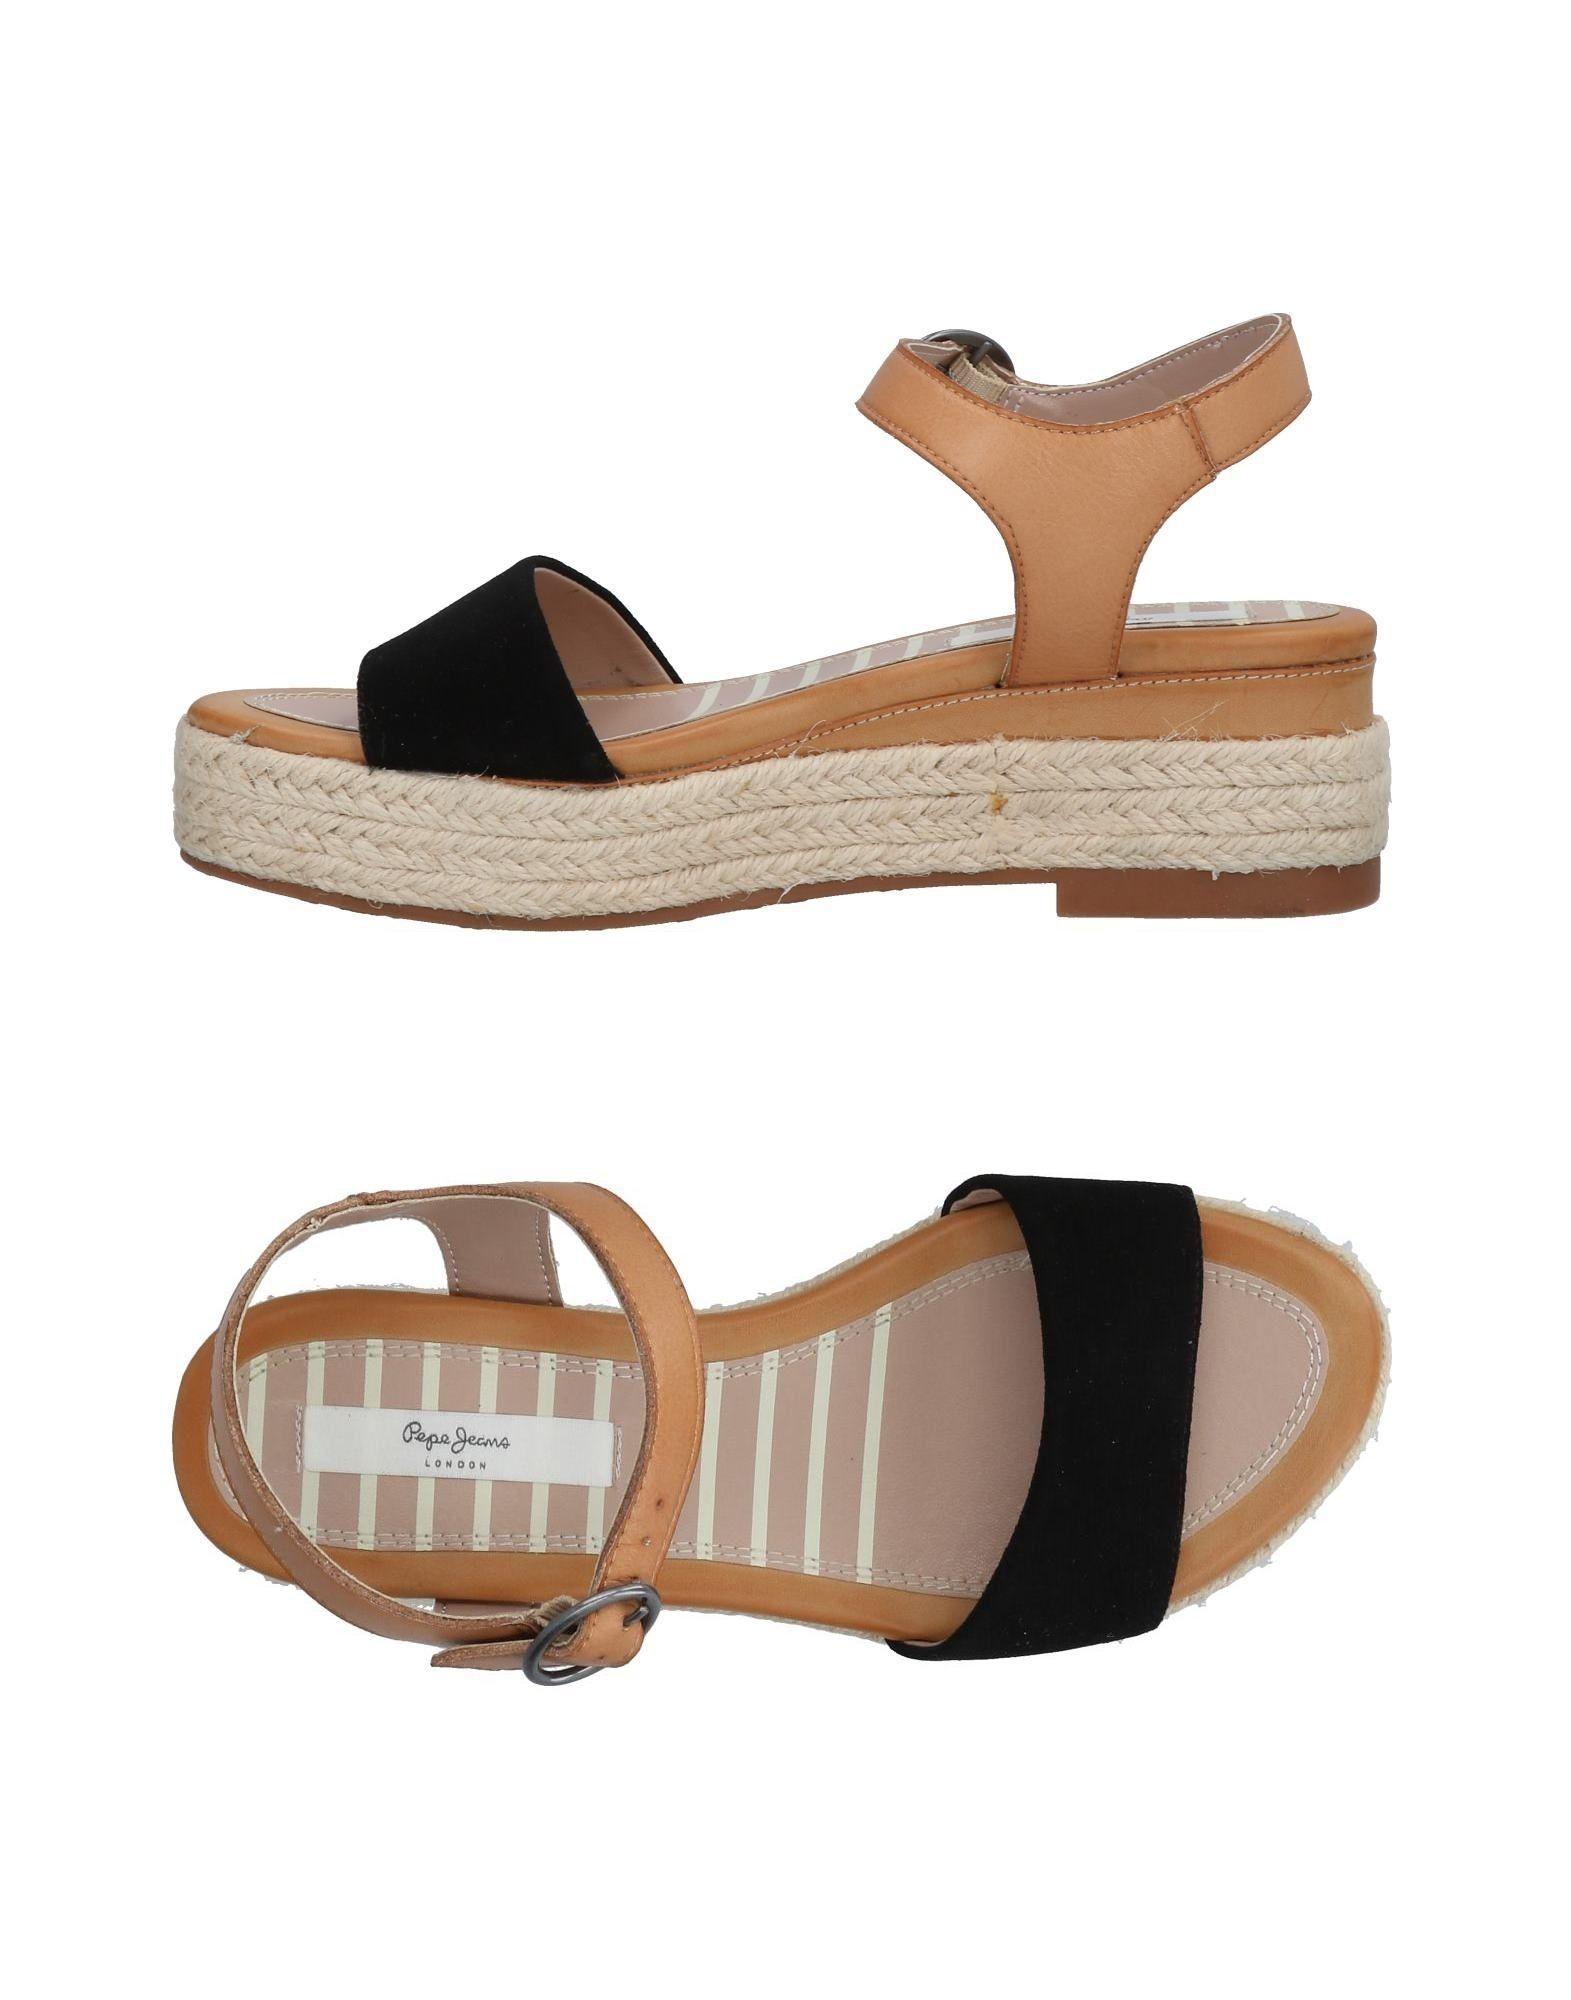 Sandali Pepe Jeans Donna - 11479879BX